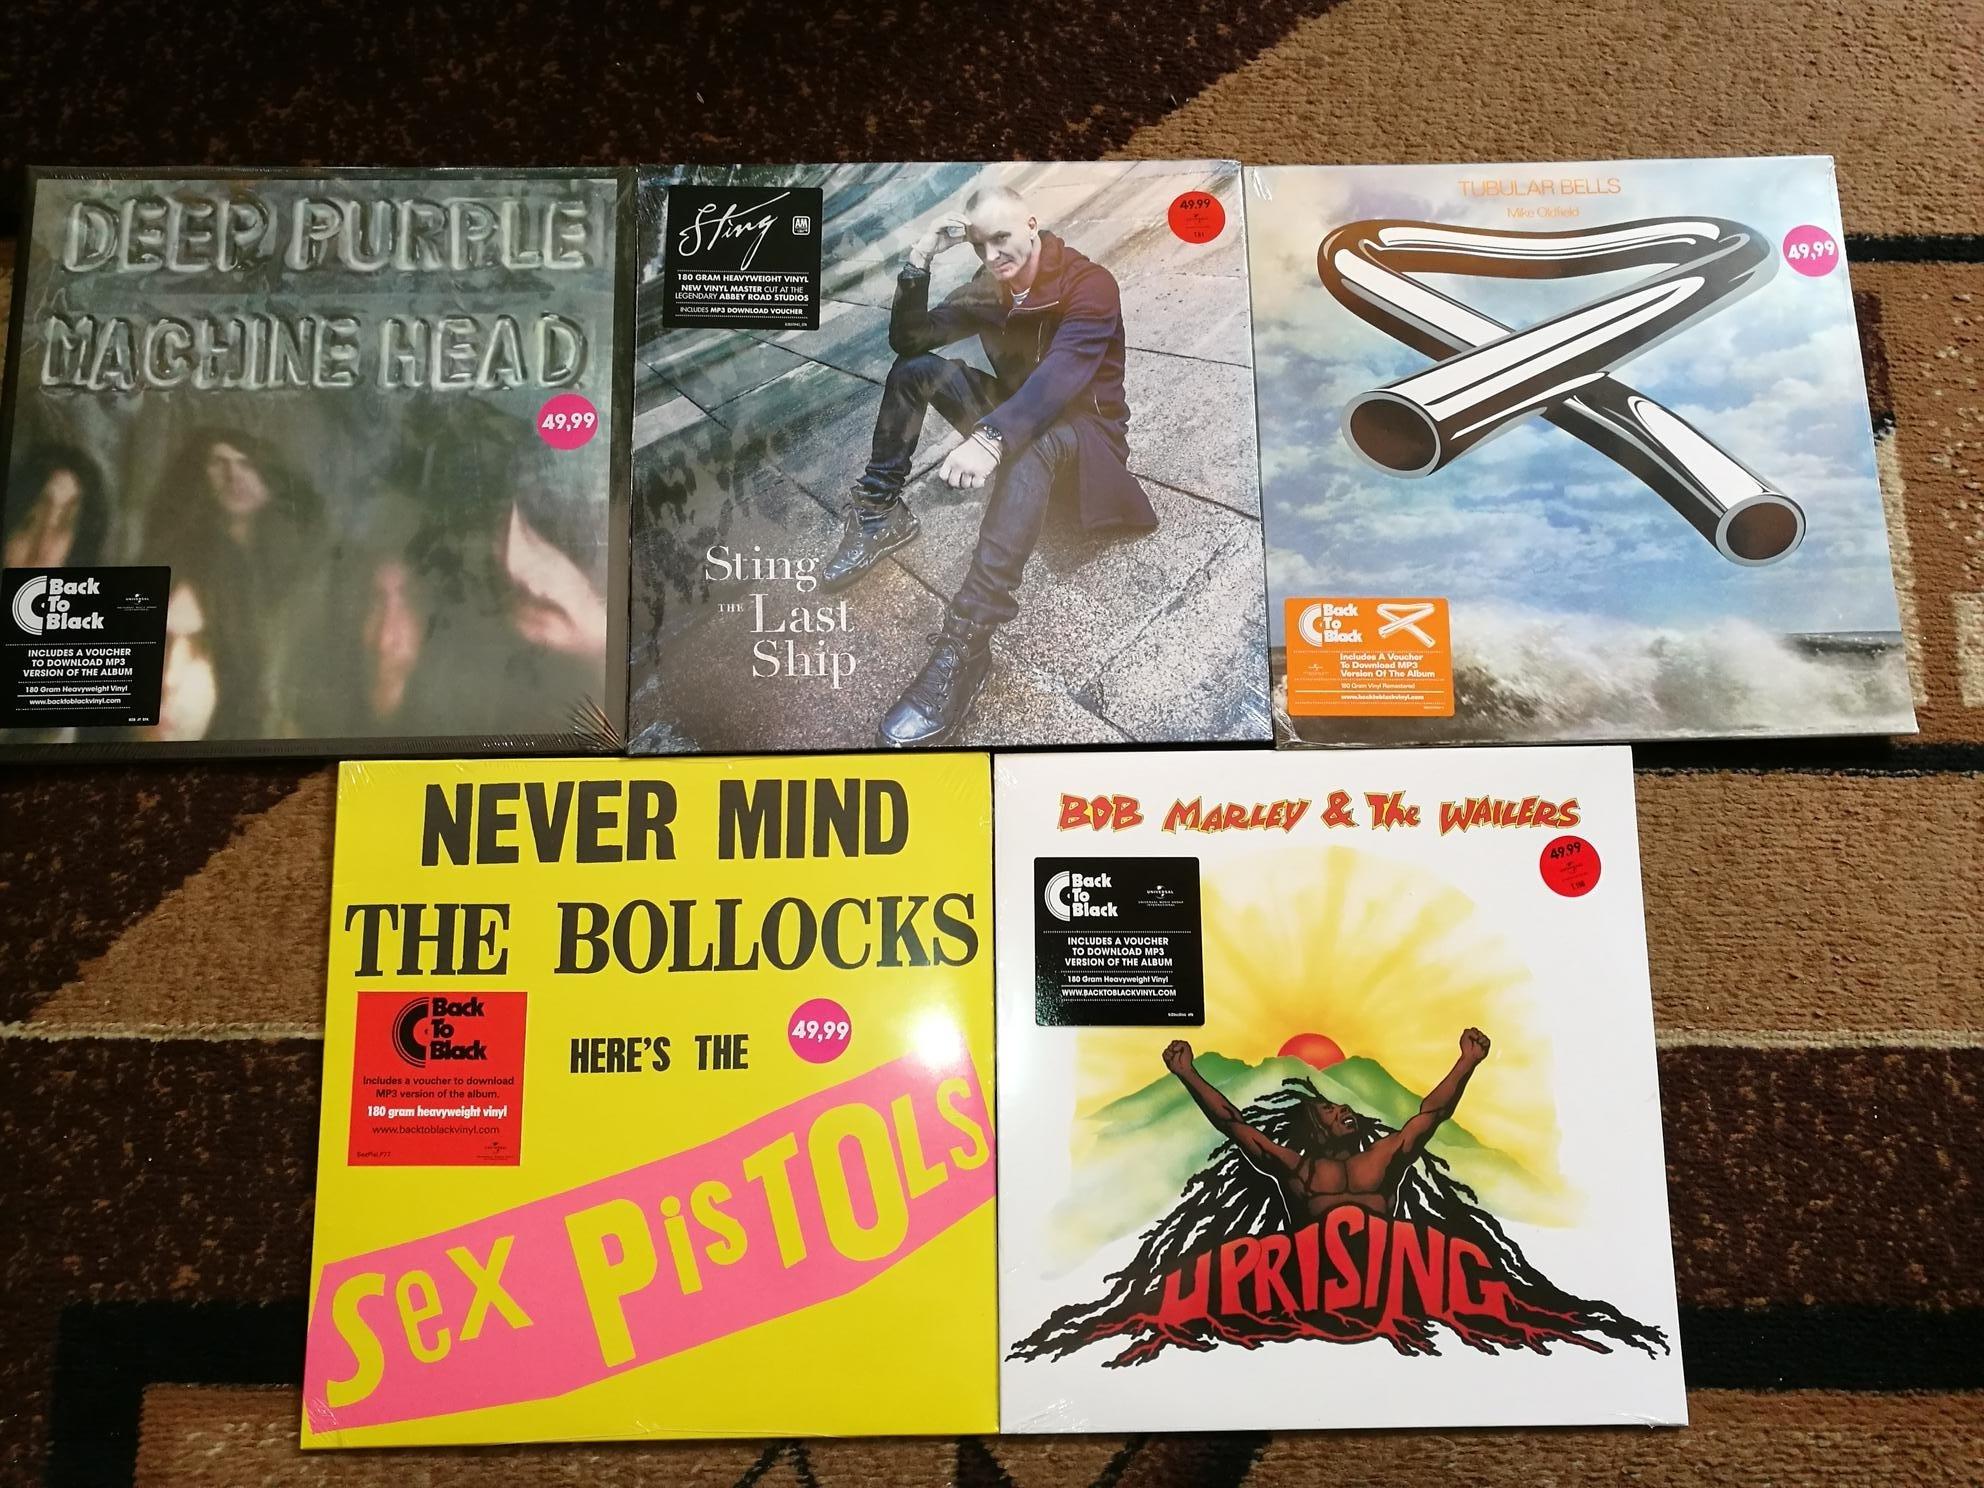 Purple, Sting, Marley, Sex Pistols, Oldfield